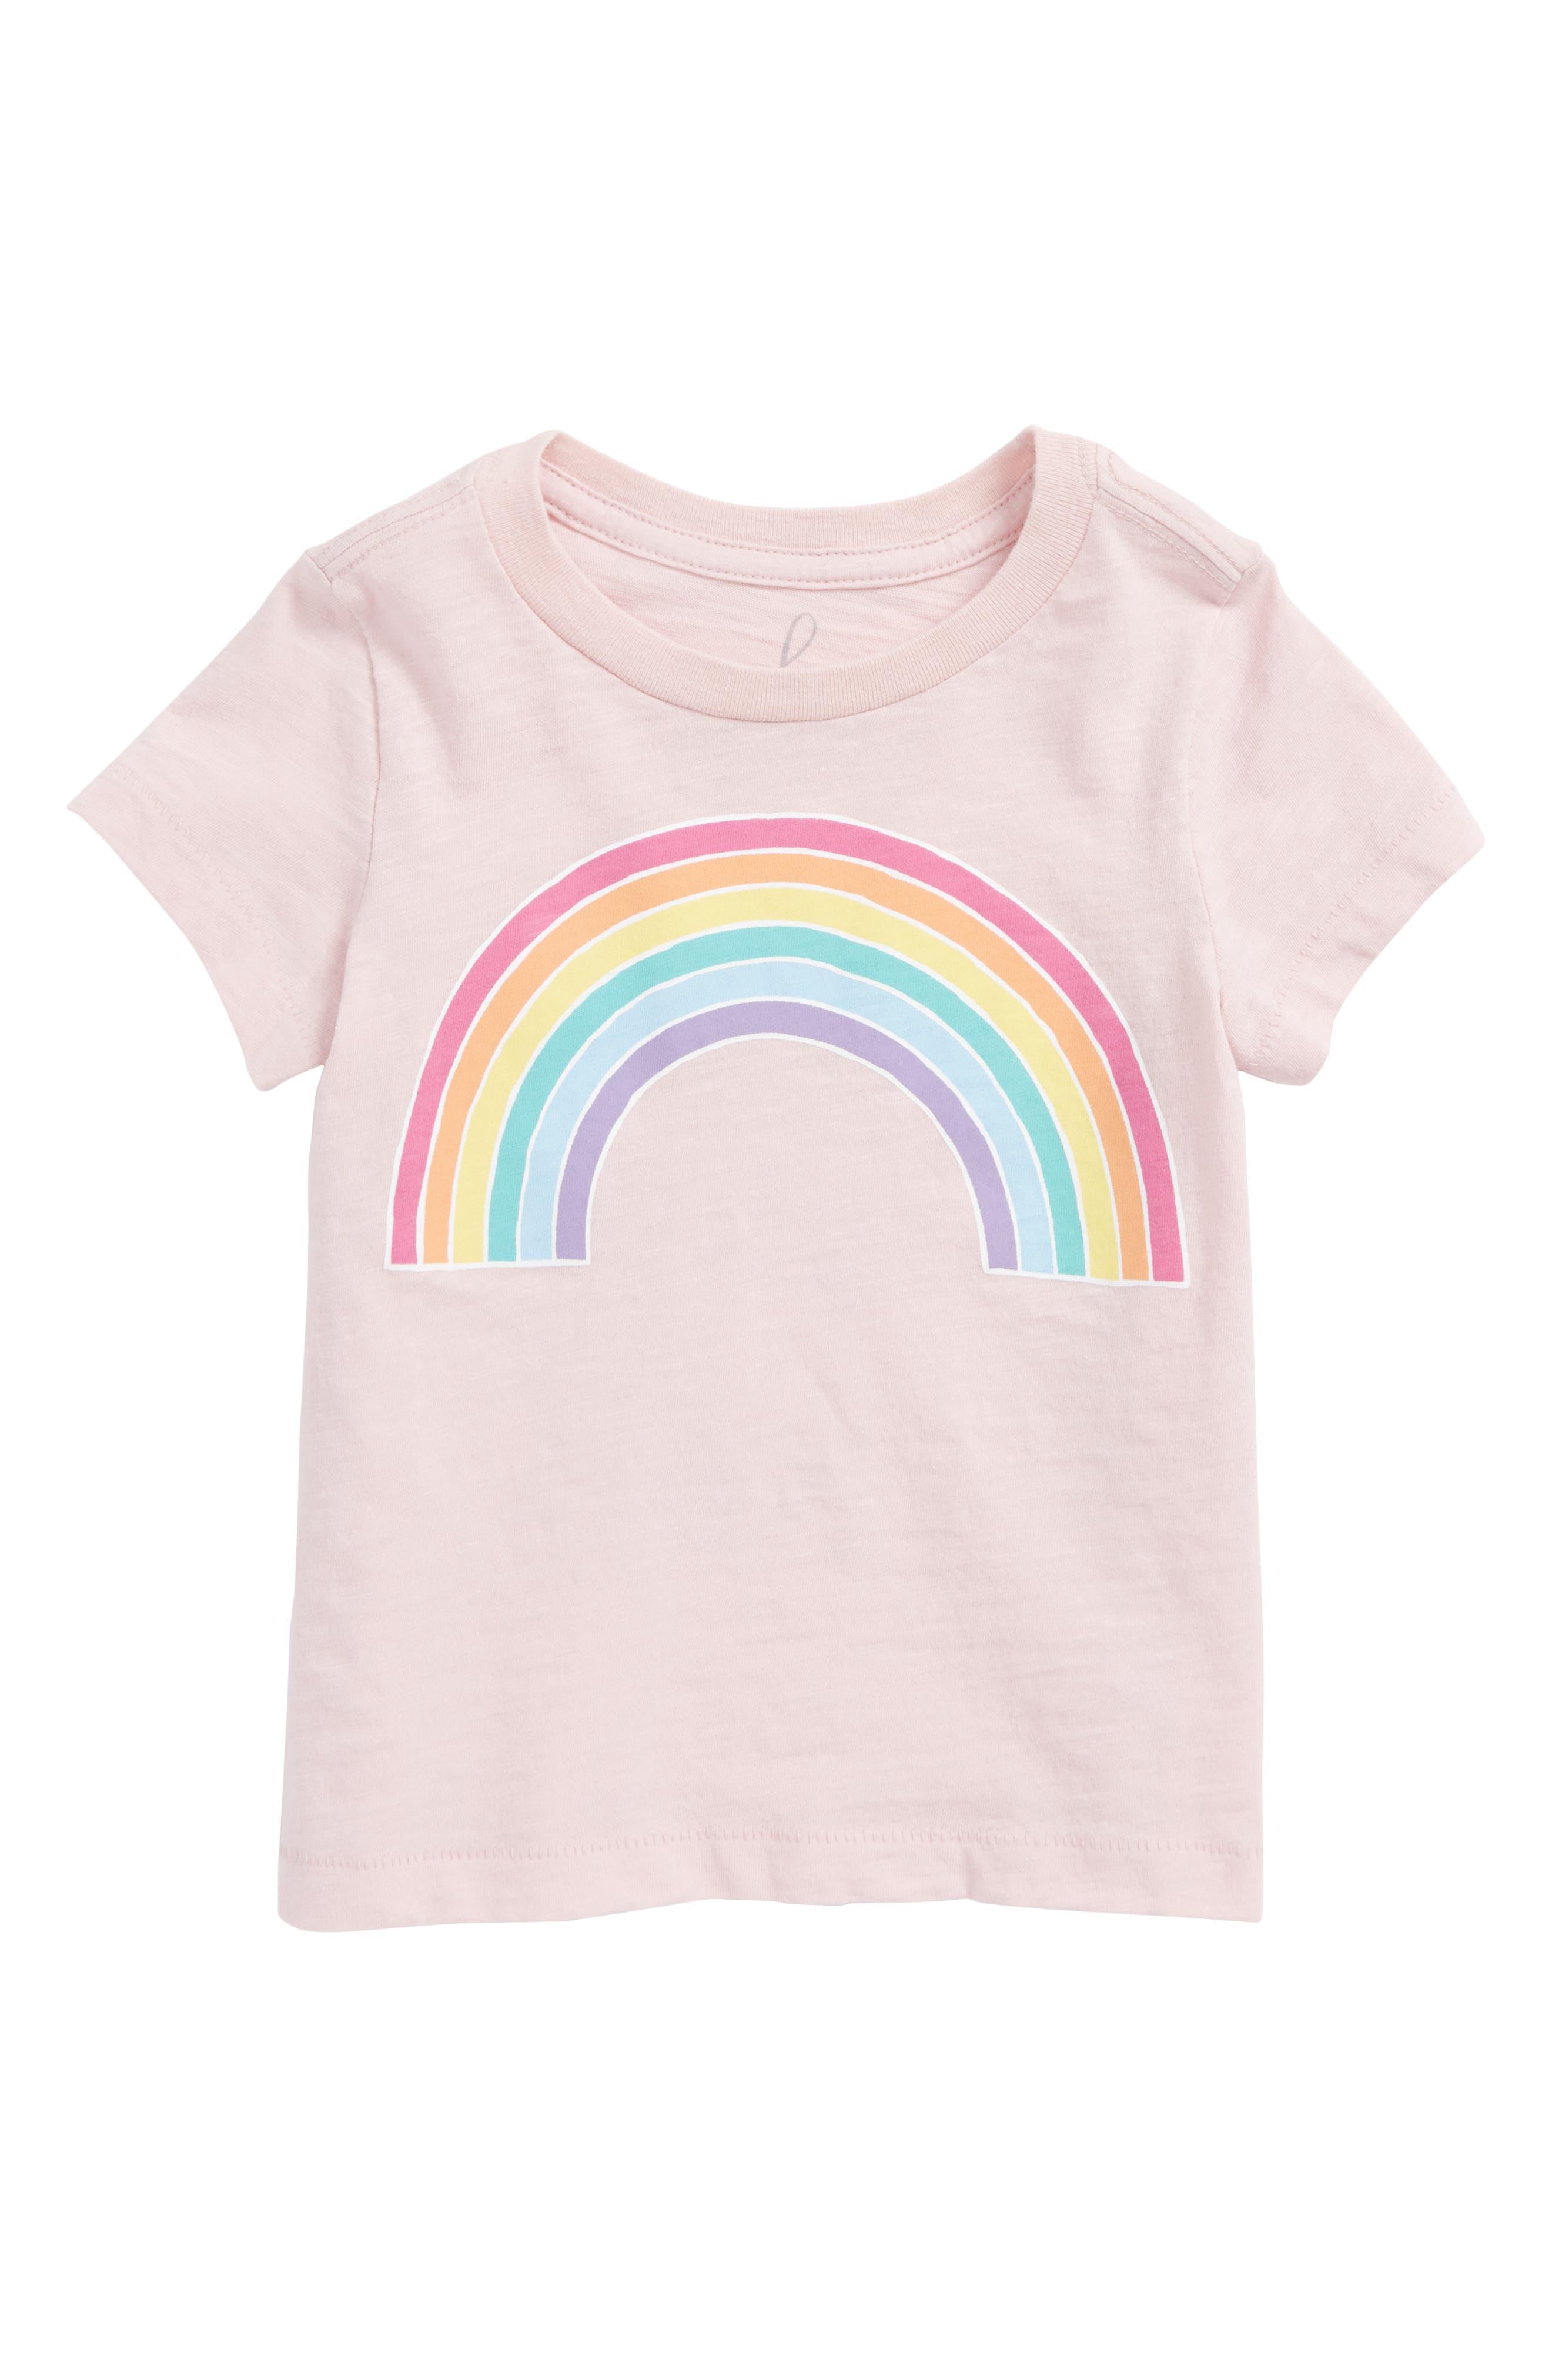 Rainbow Graphic Tee,                         Main,                         color, Light Pink